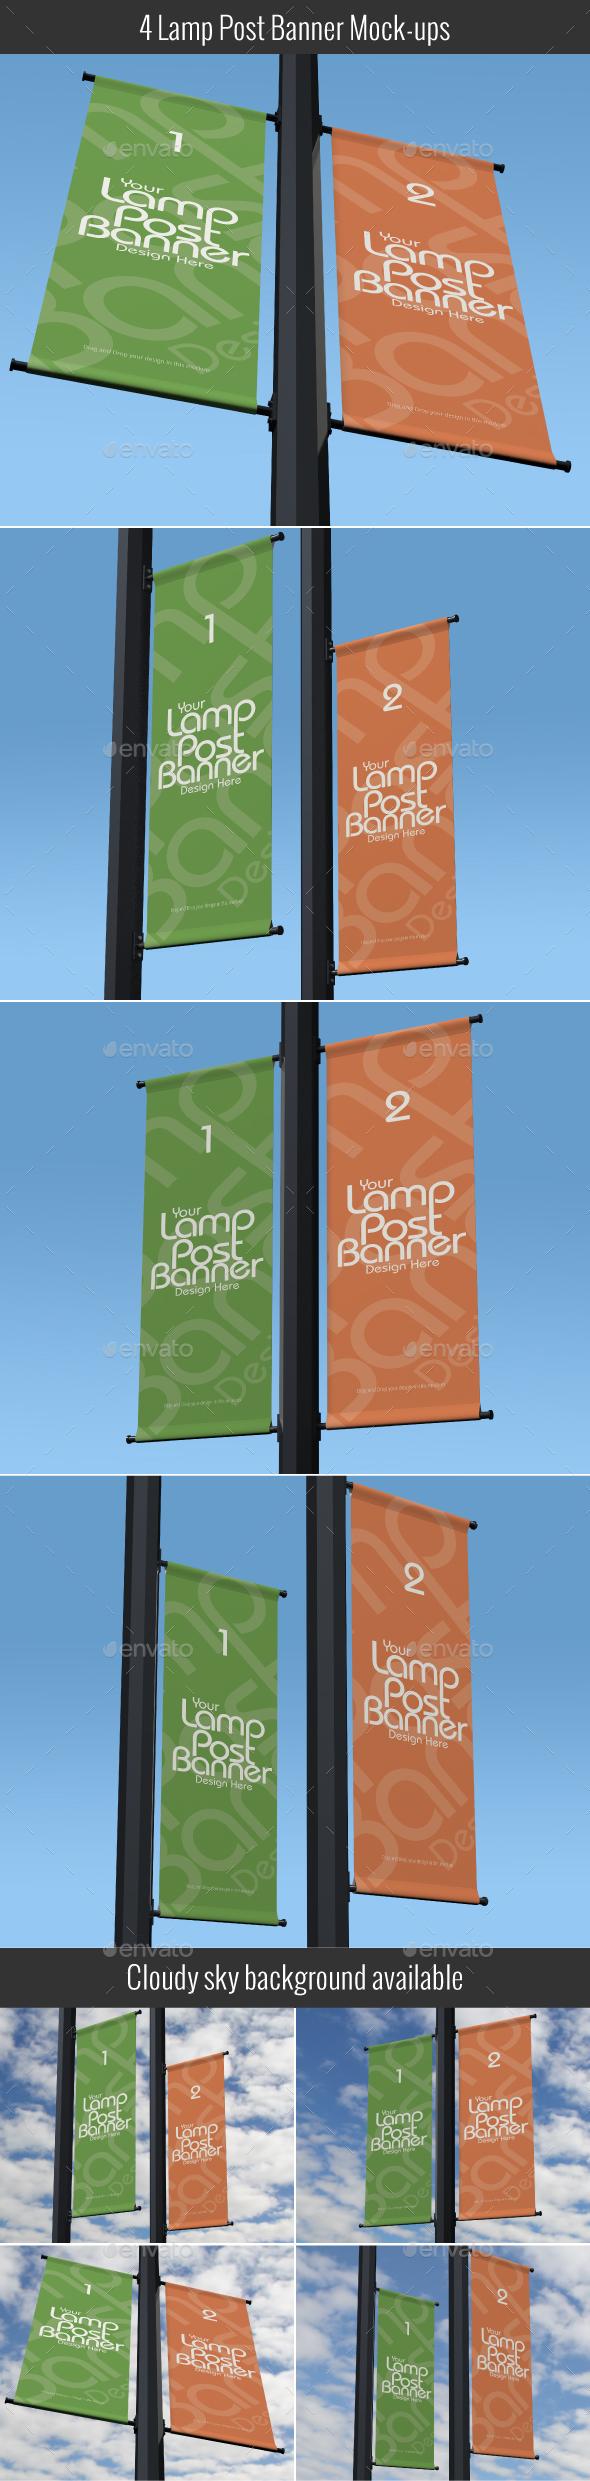 Lamp Post Banner Mockup - Signage Print